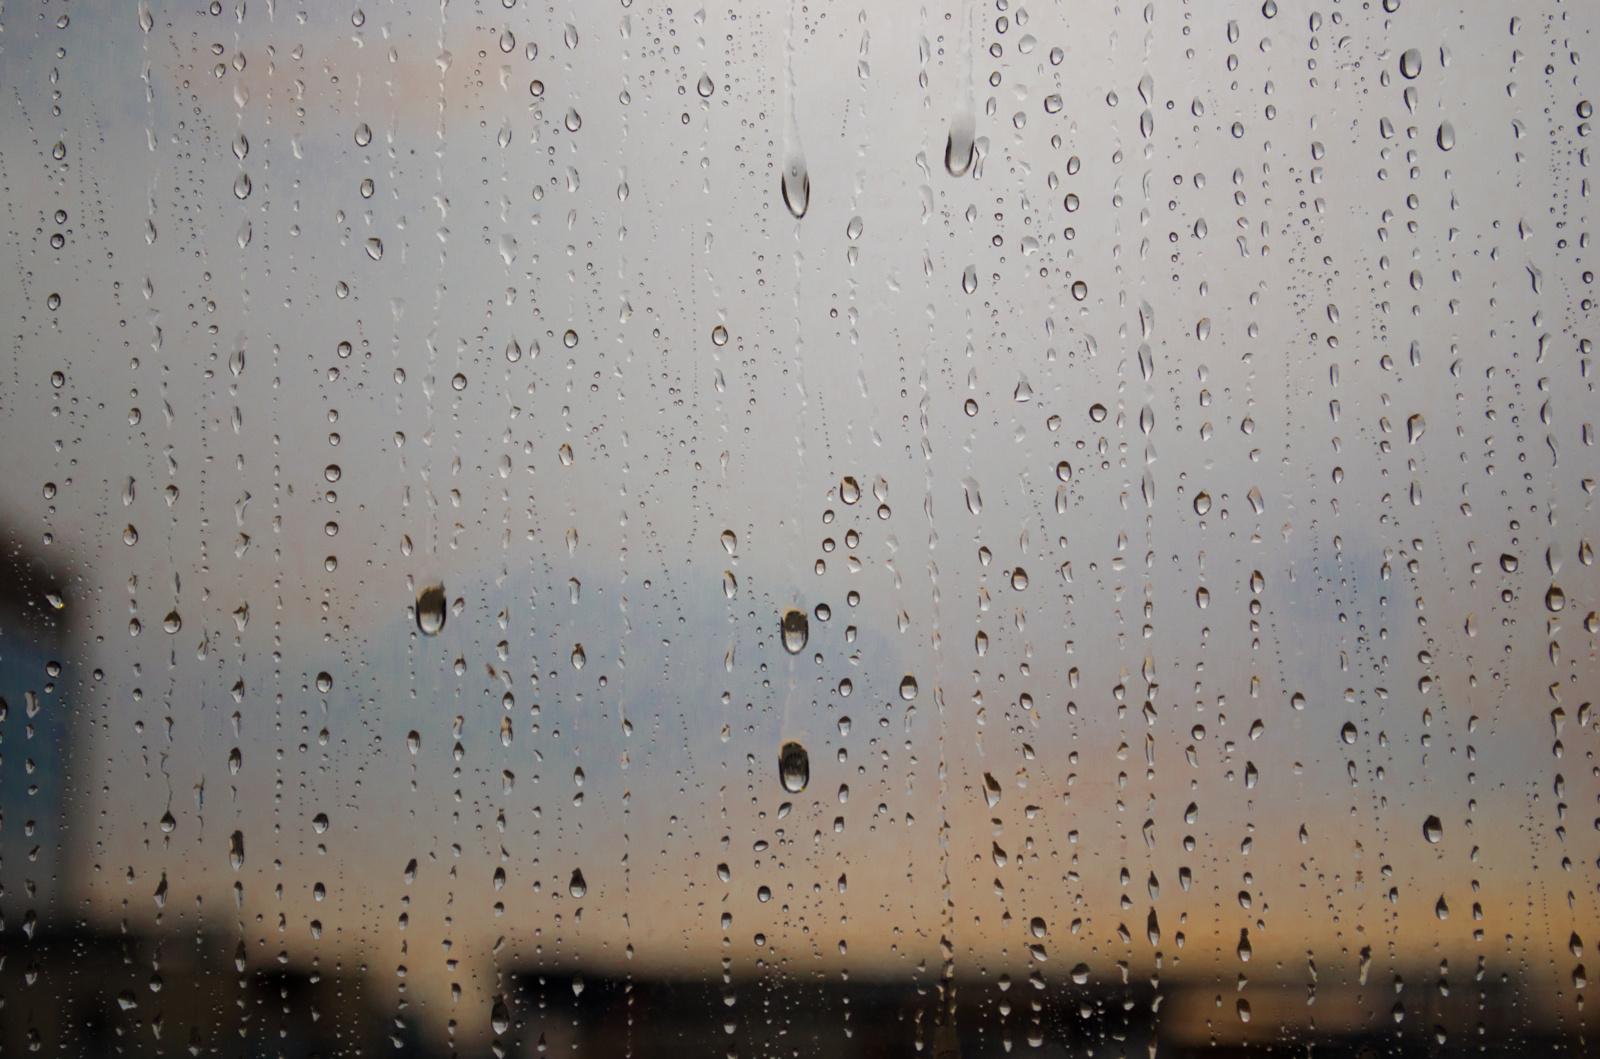 Karštį beveik kasdien lydės lietus su perkūnija